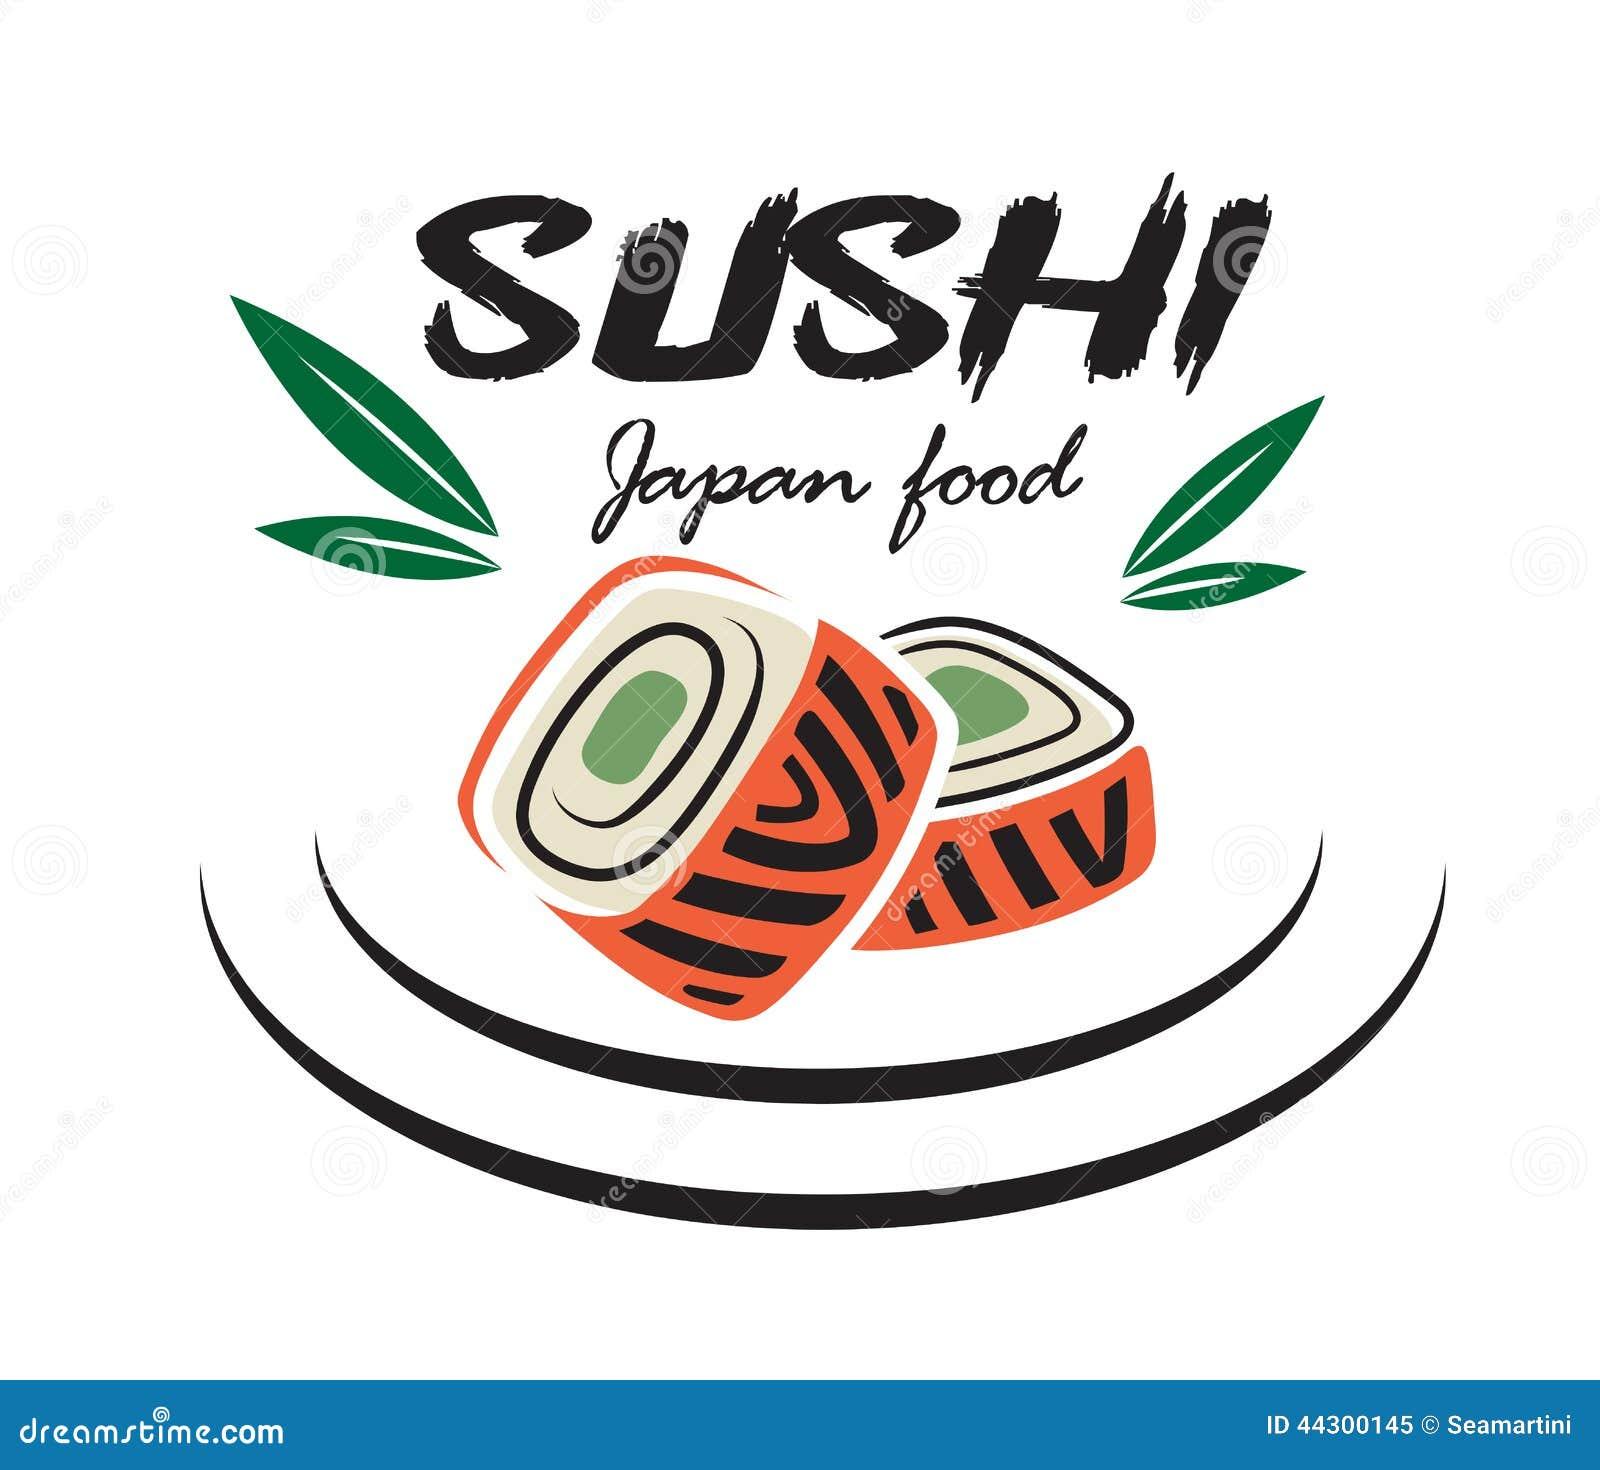 Japanese Sushi Seafood Emblem Stock Vector Image 44300145